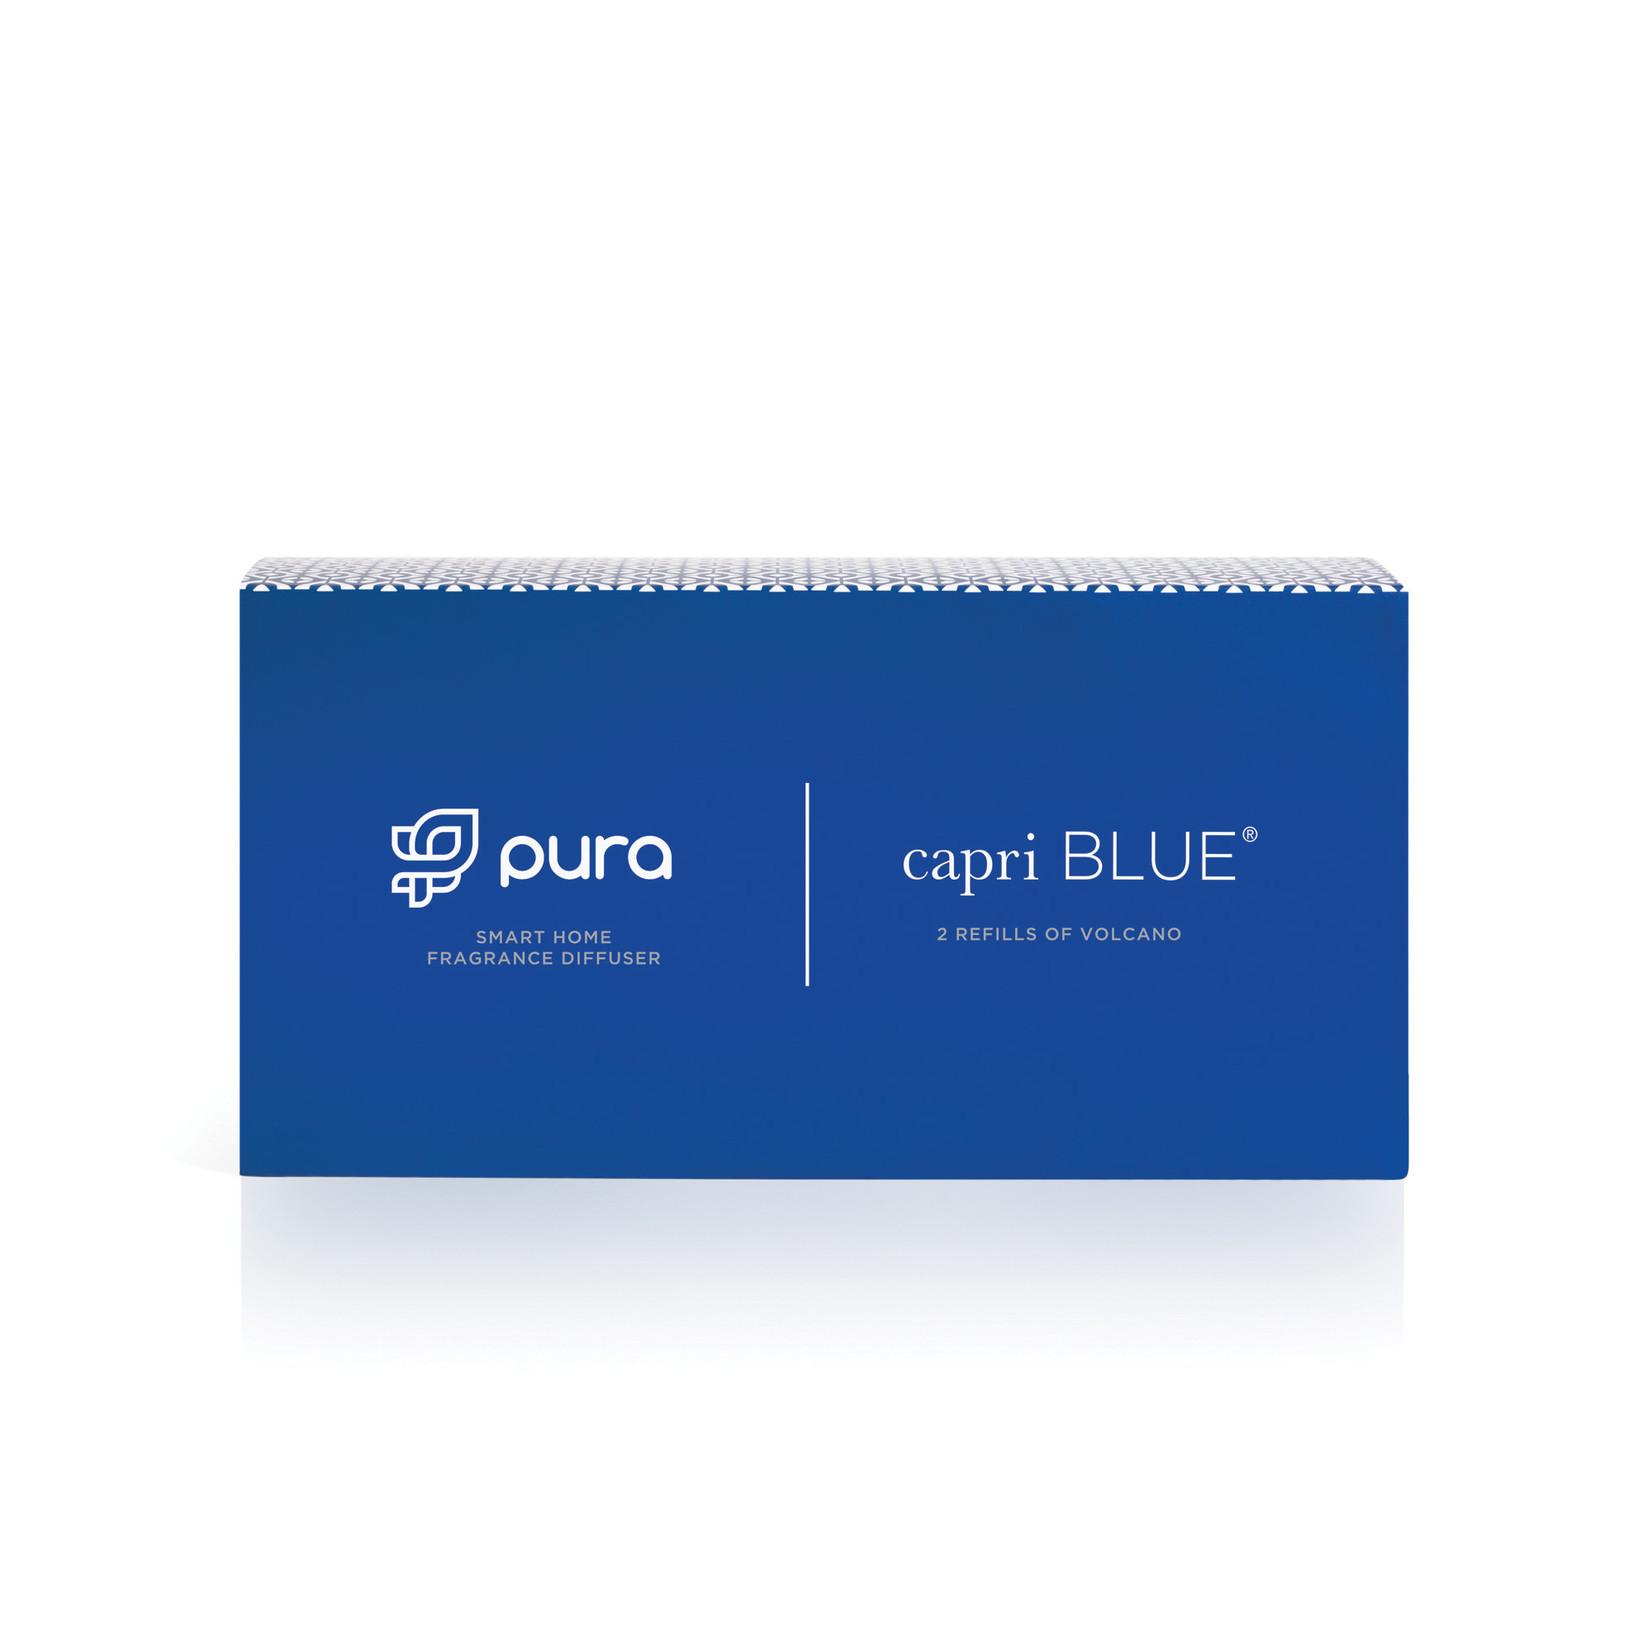 capri BLUE® CB + Pura Smart Home Diffuser Kit, Volcano